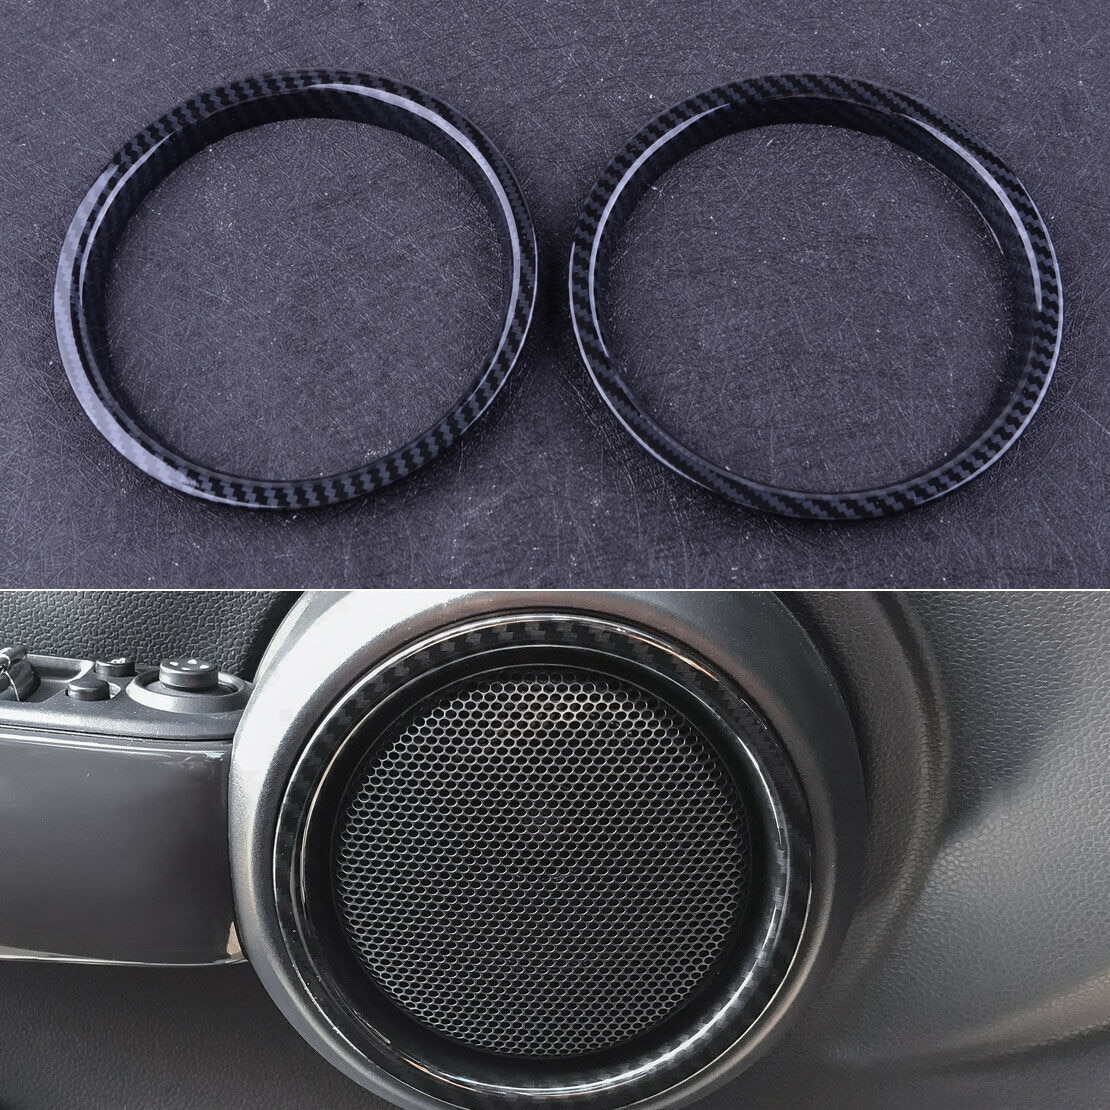 Beler plástico 1 par de estilo de fibra de carbono Interior puerta altavoz anillo cubierta ajuste para Mini Cooper F56 F57 2016 2017 2018 2019